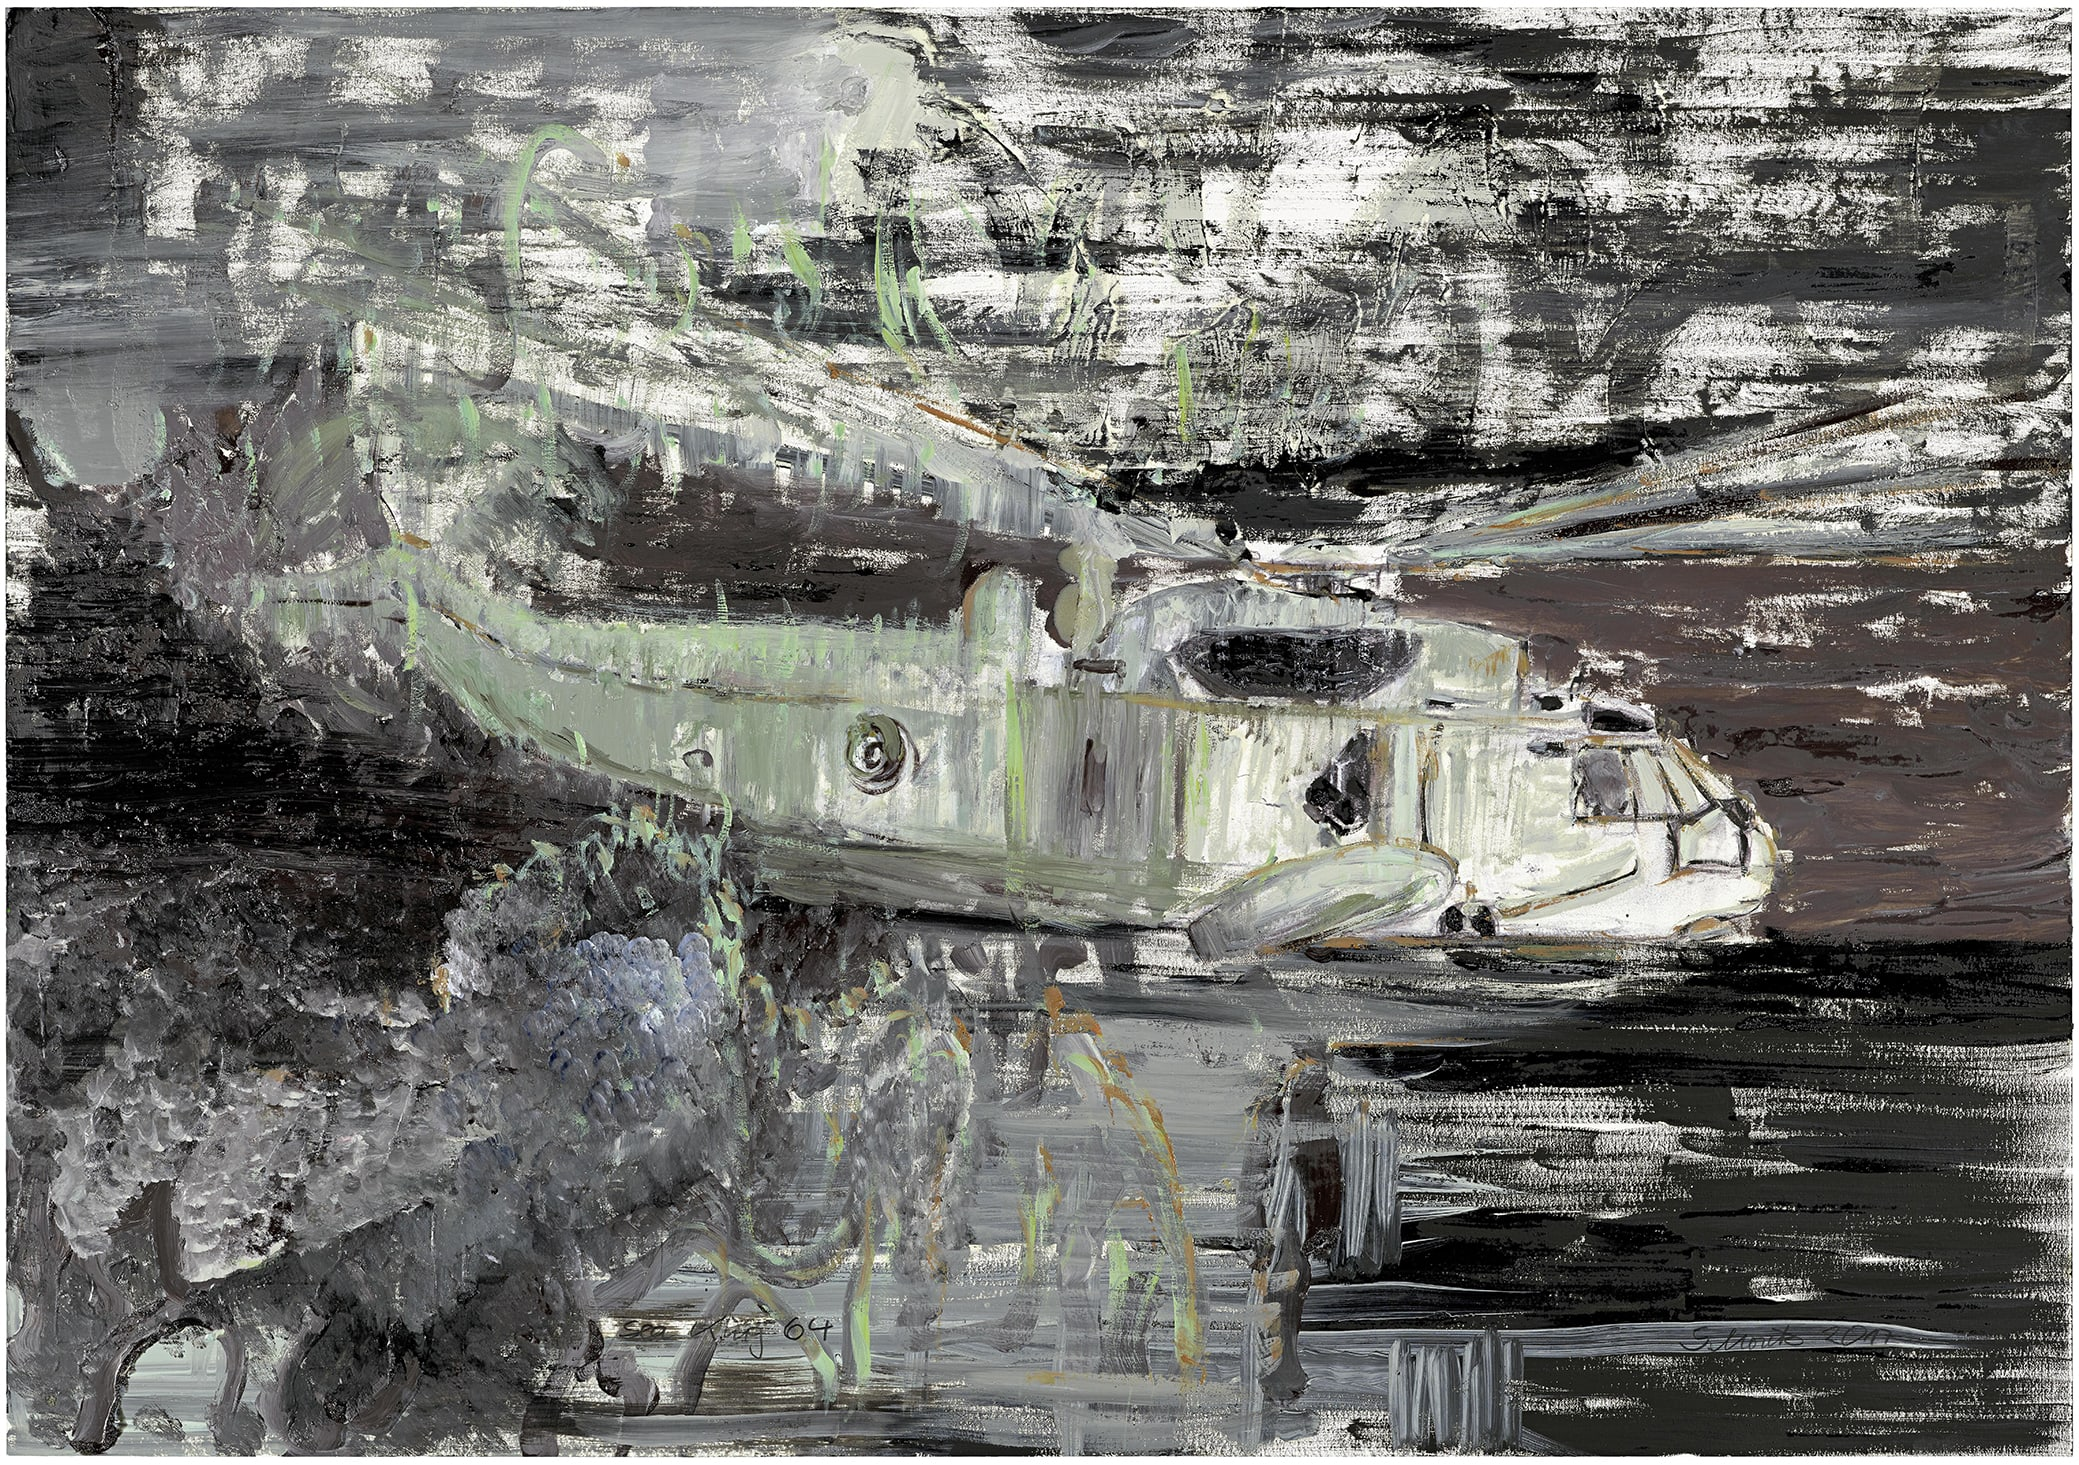 Sabine Moritz, Sea King 64, 2017